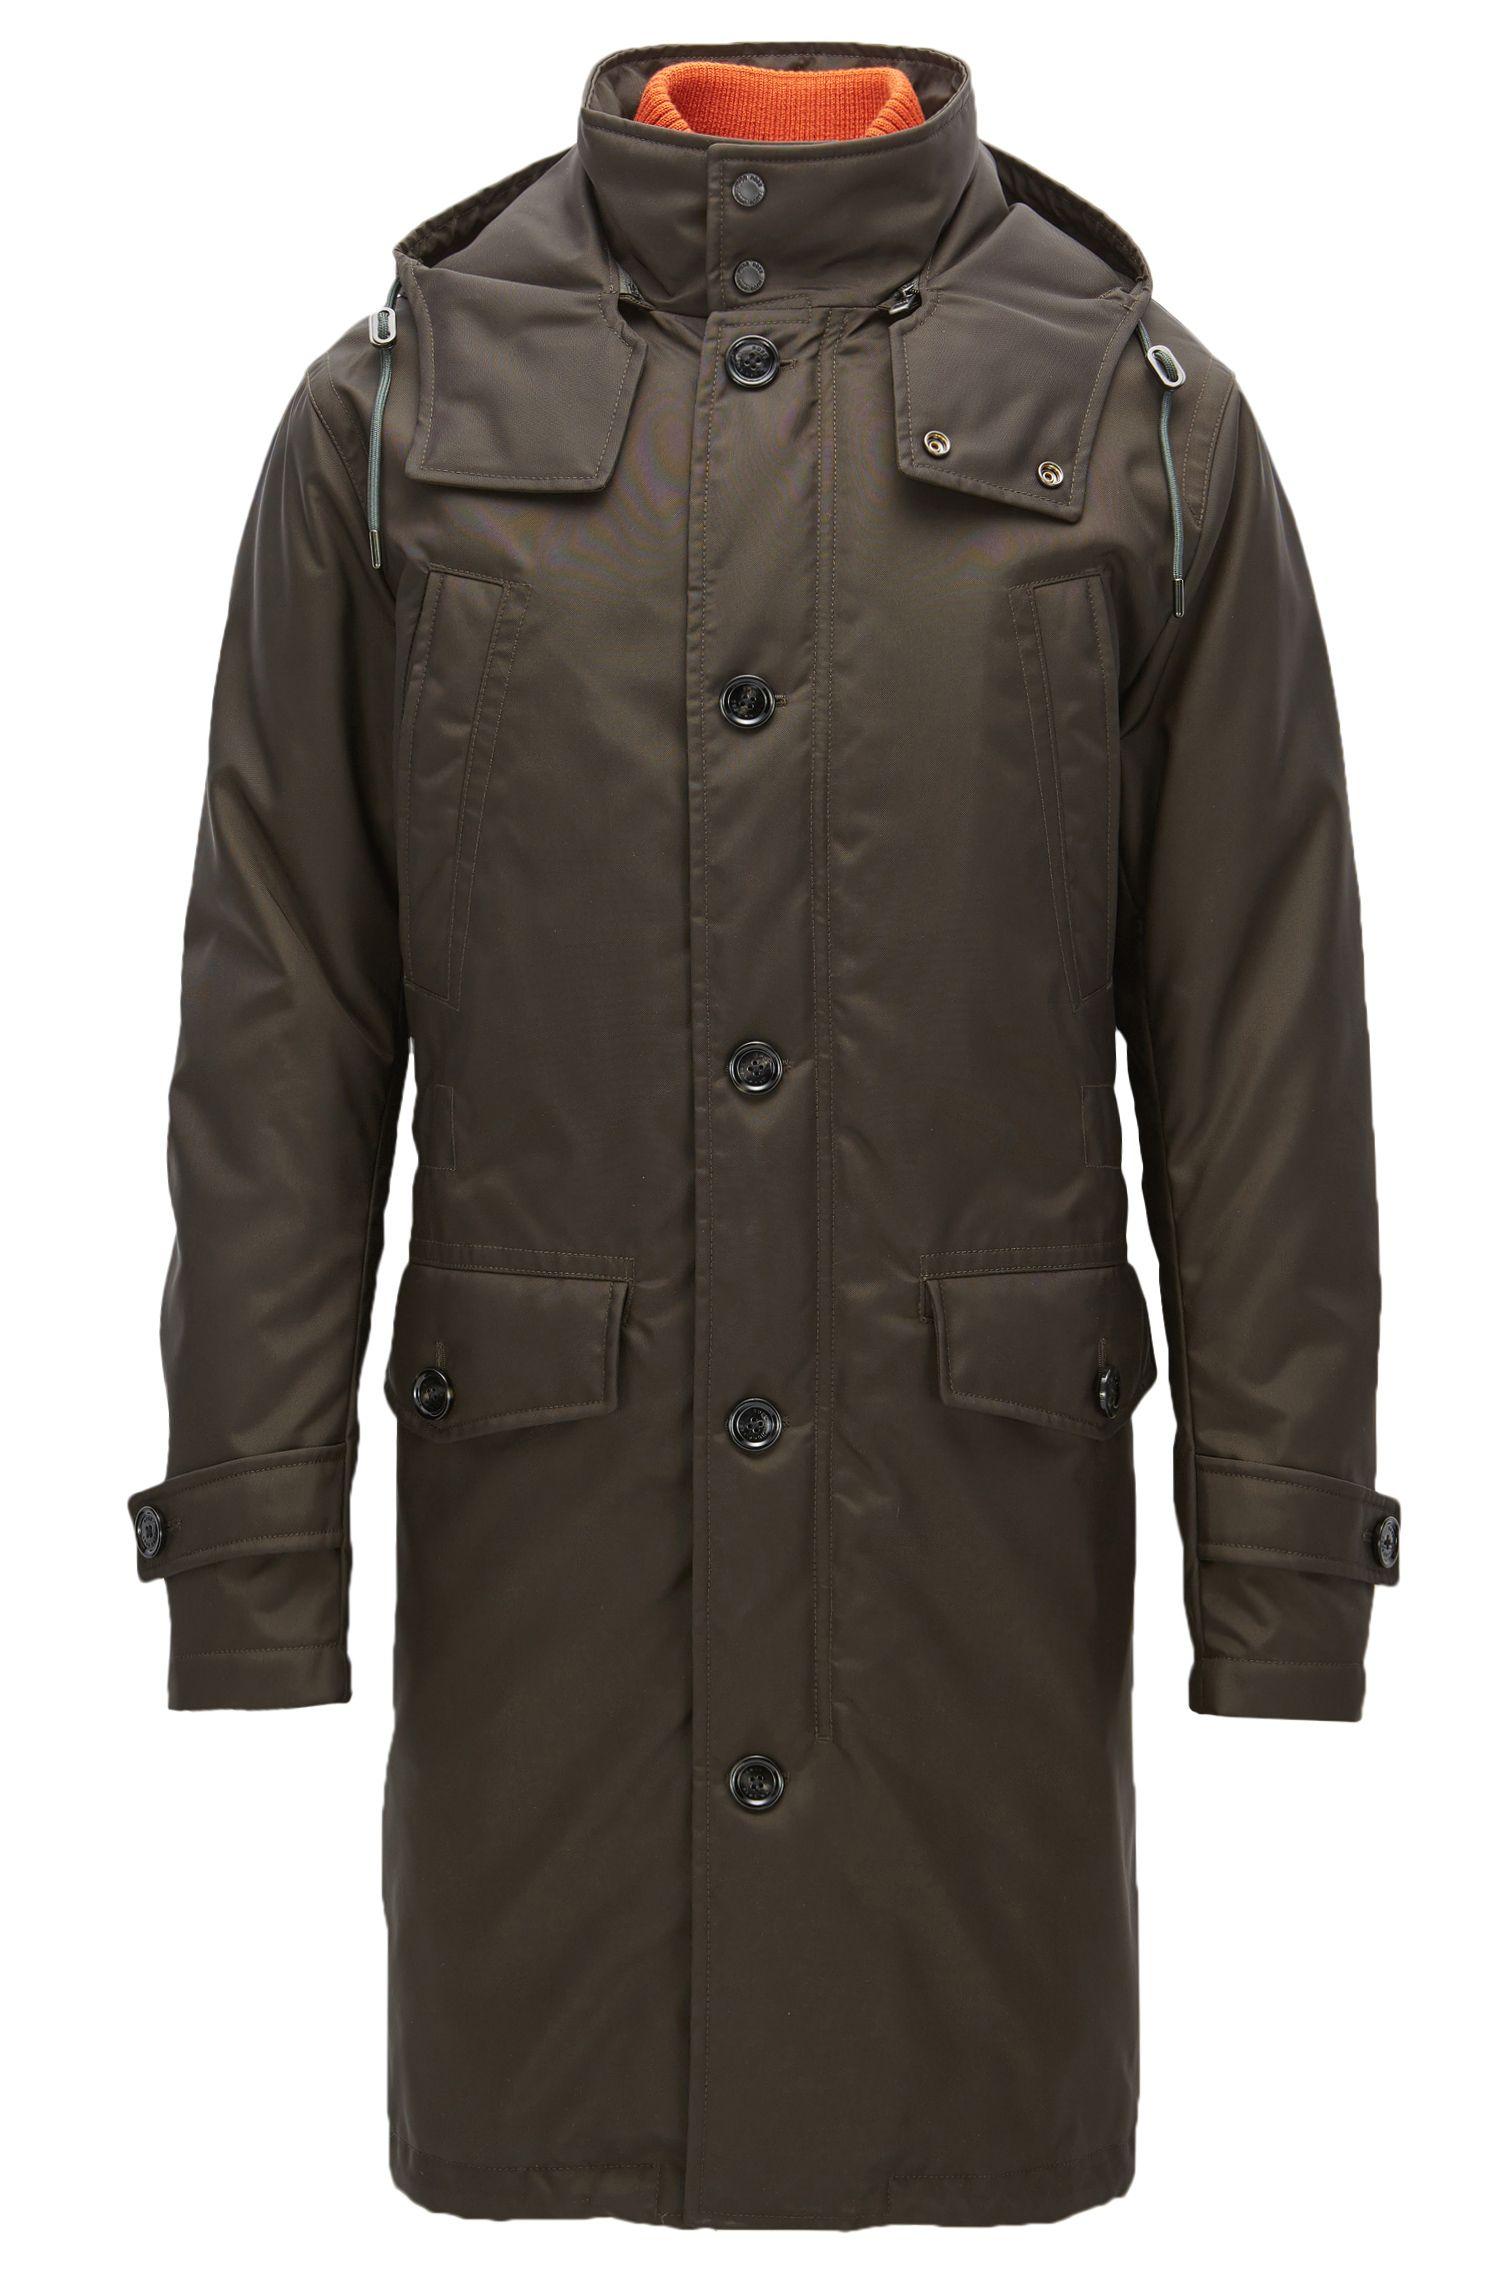 Water-repellent coat in an oversized fit